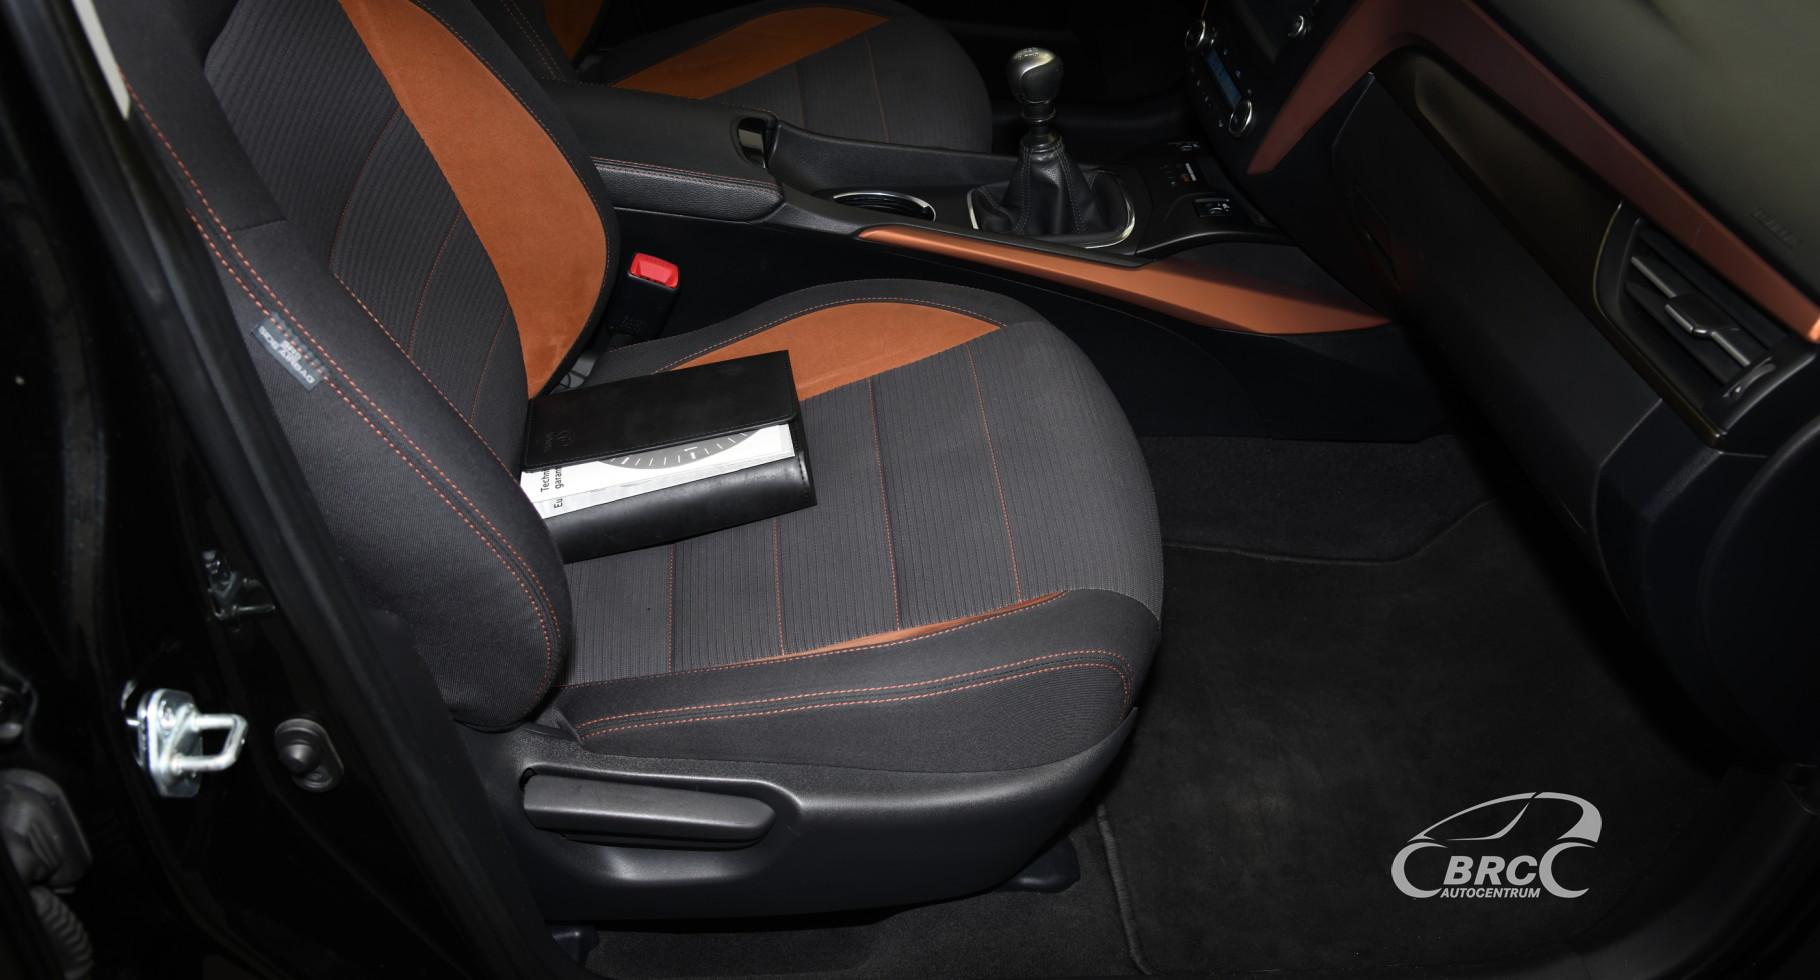 Toyota Avensis 1.8i Valvematic Active